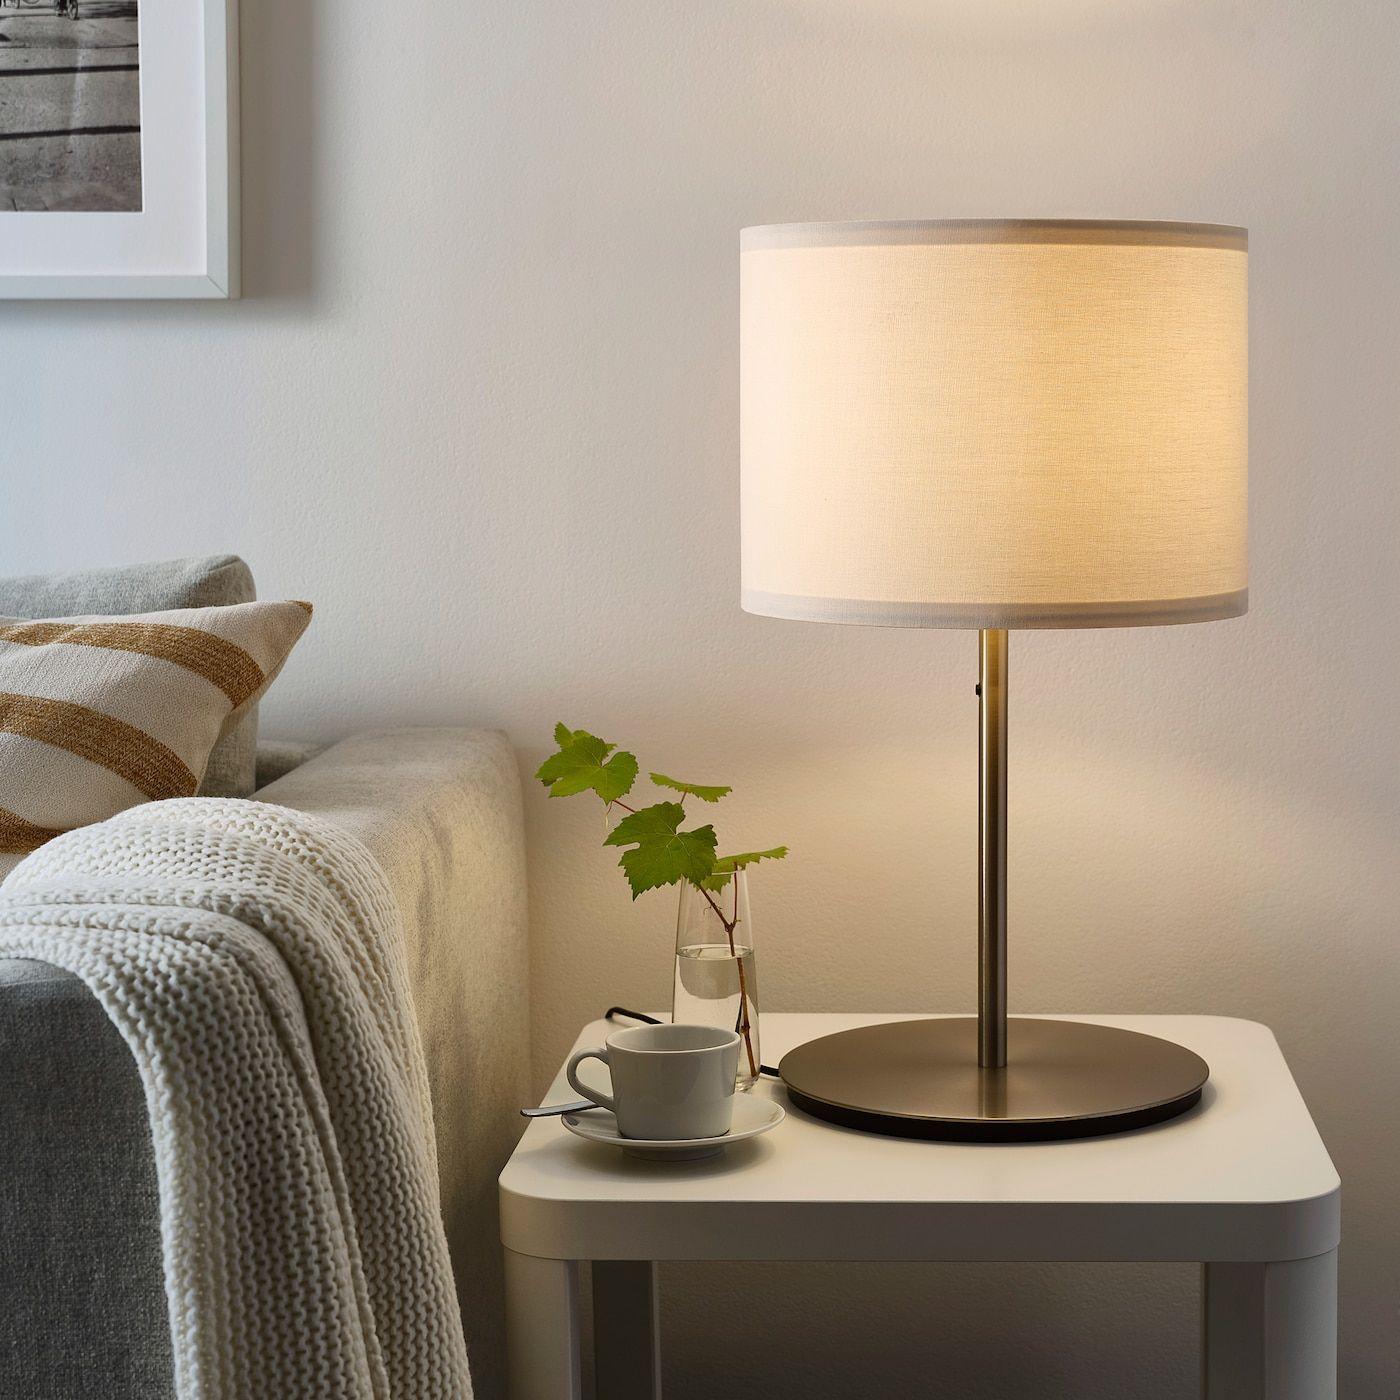 RINGSTA Lamp shade, white IKEA in 2020 | Table lamp base